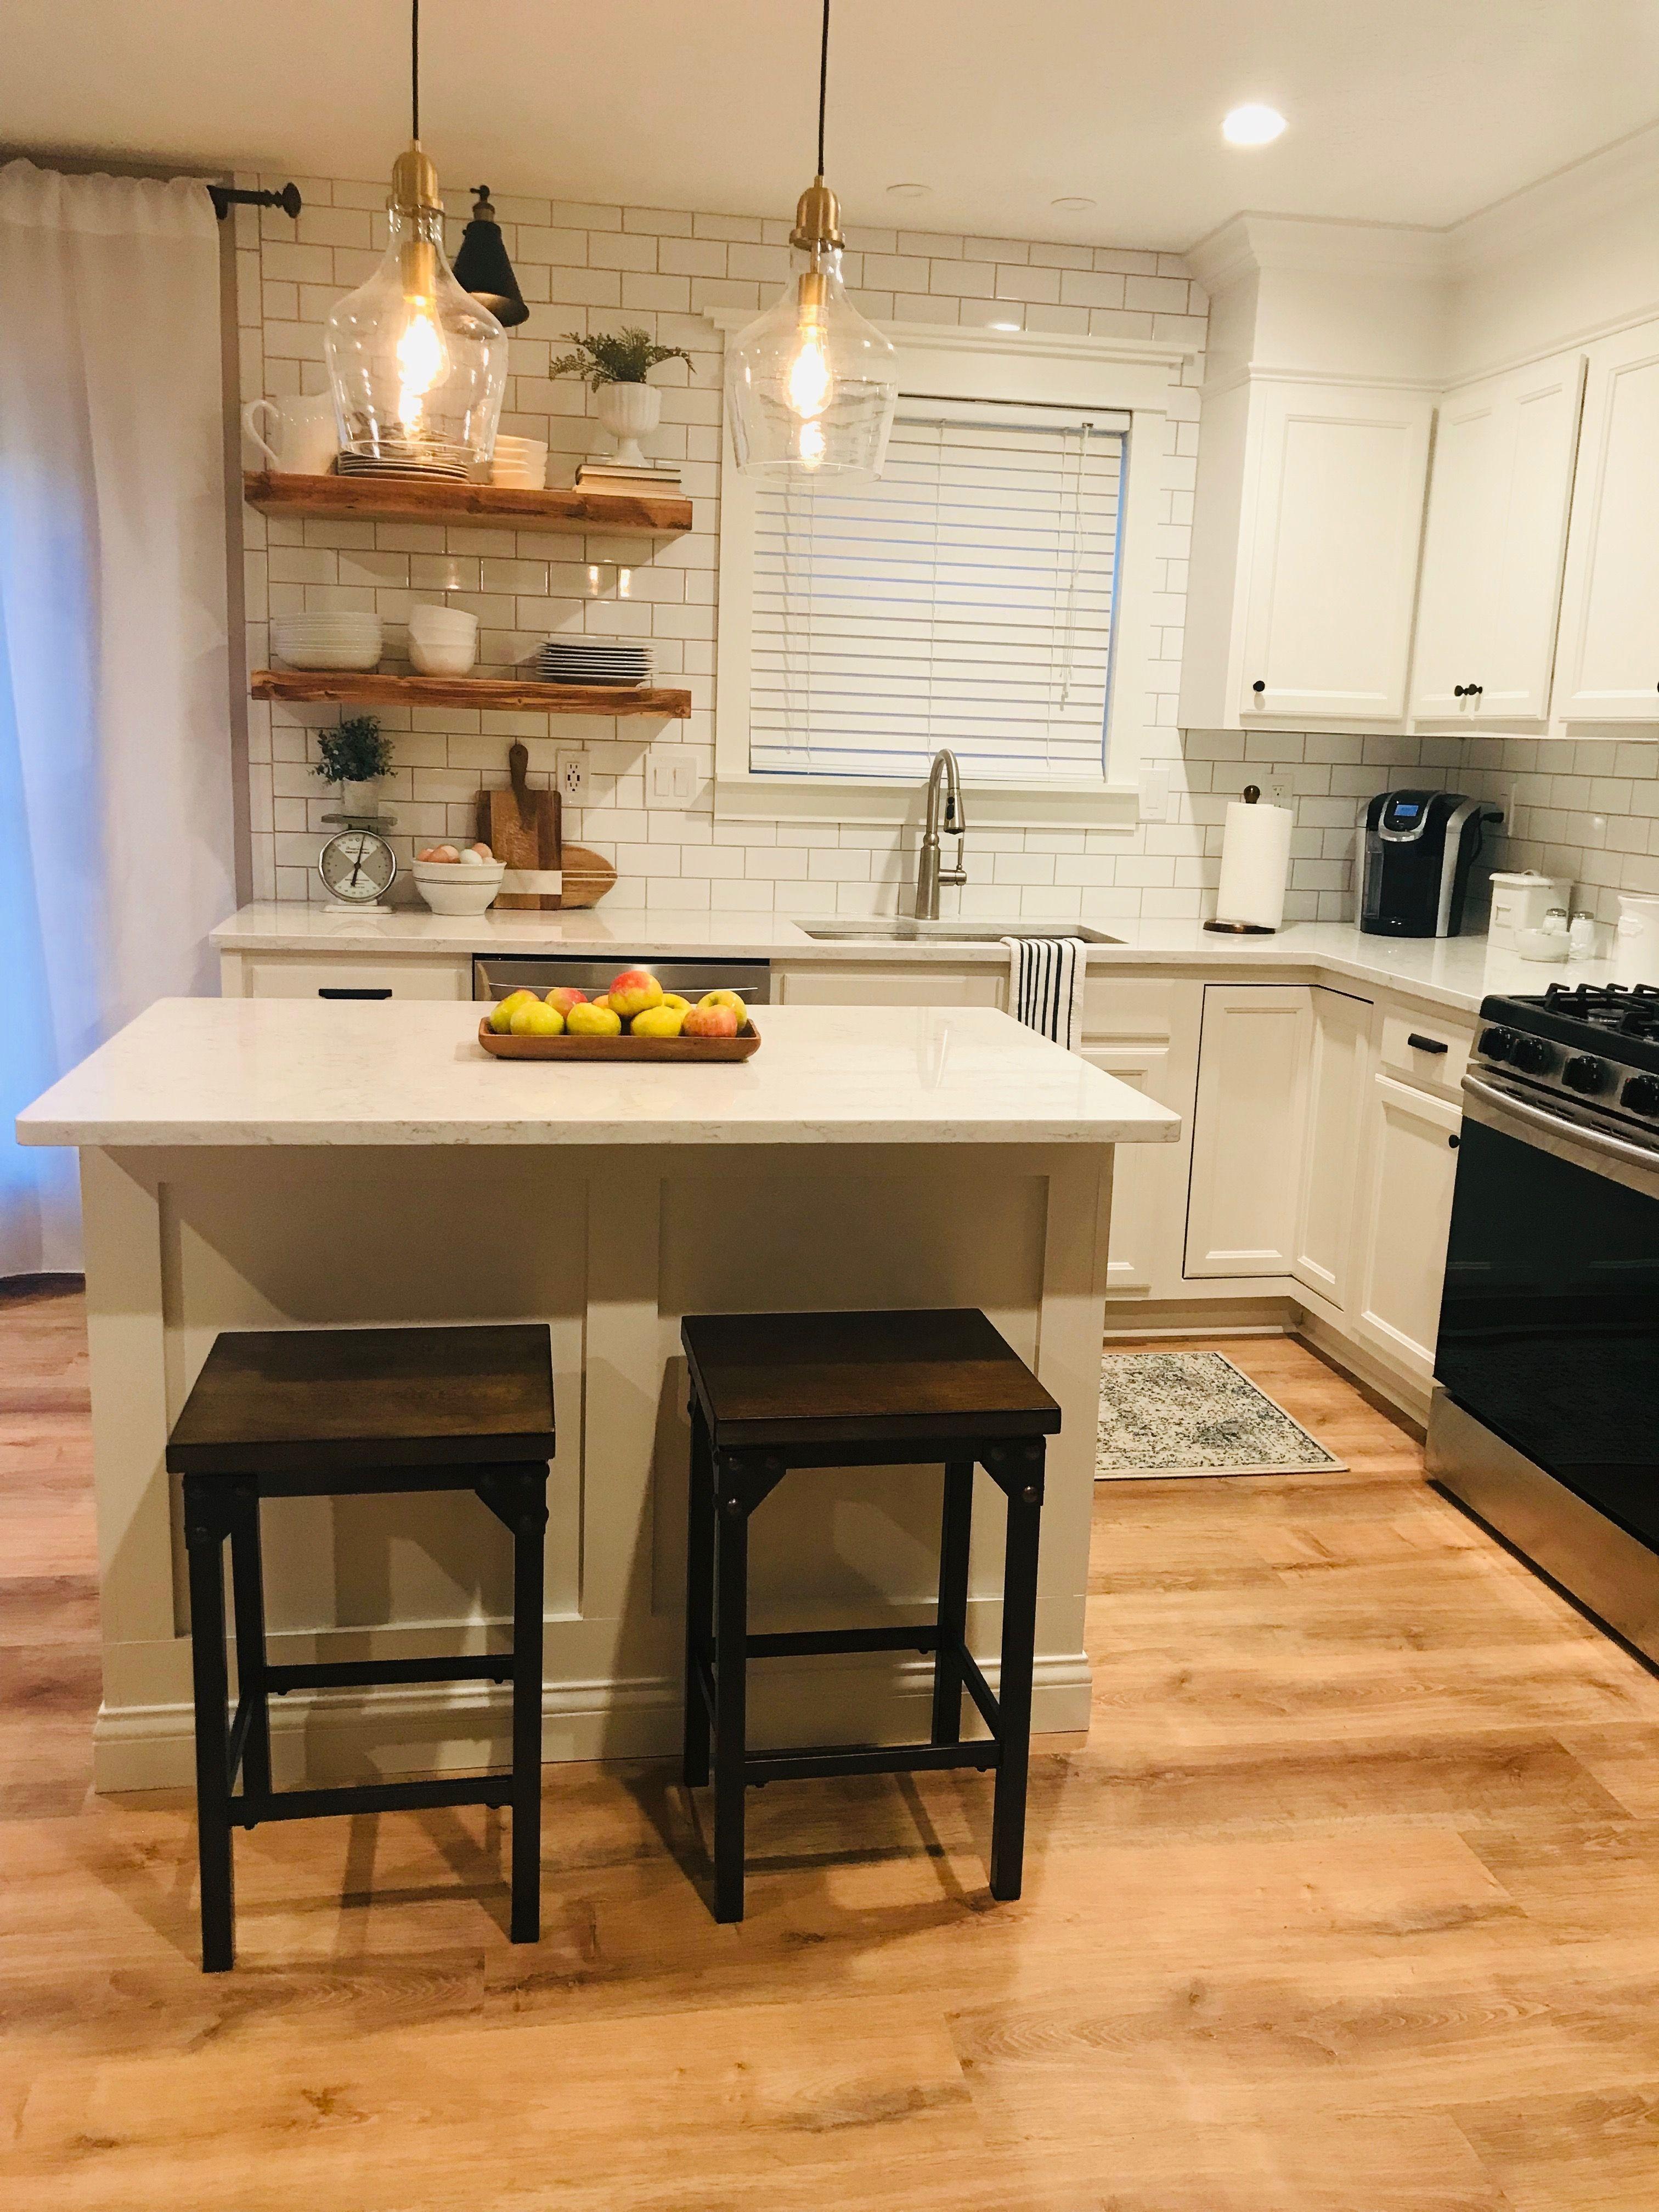 Flooring Is Home Depot S Lifeproof Vinyl In Fresh Oak Oak Floor Kitchen House Flooring Lifeproof Vinyl Flooring